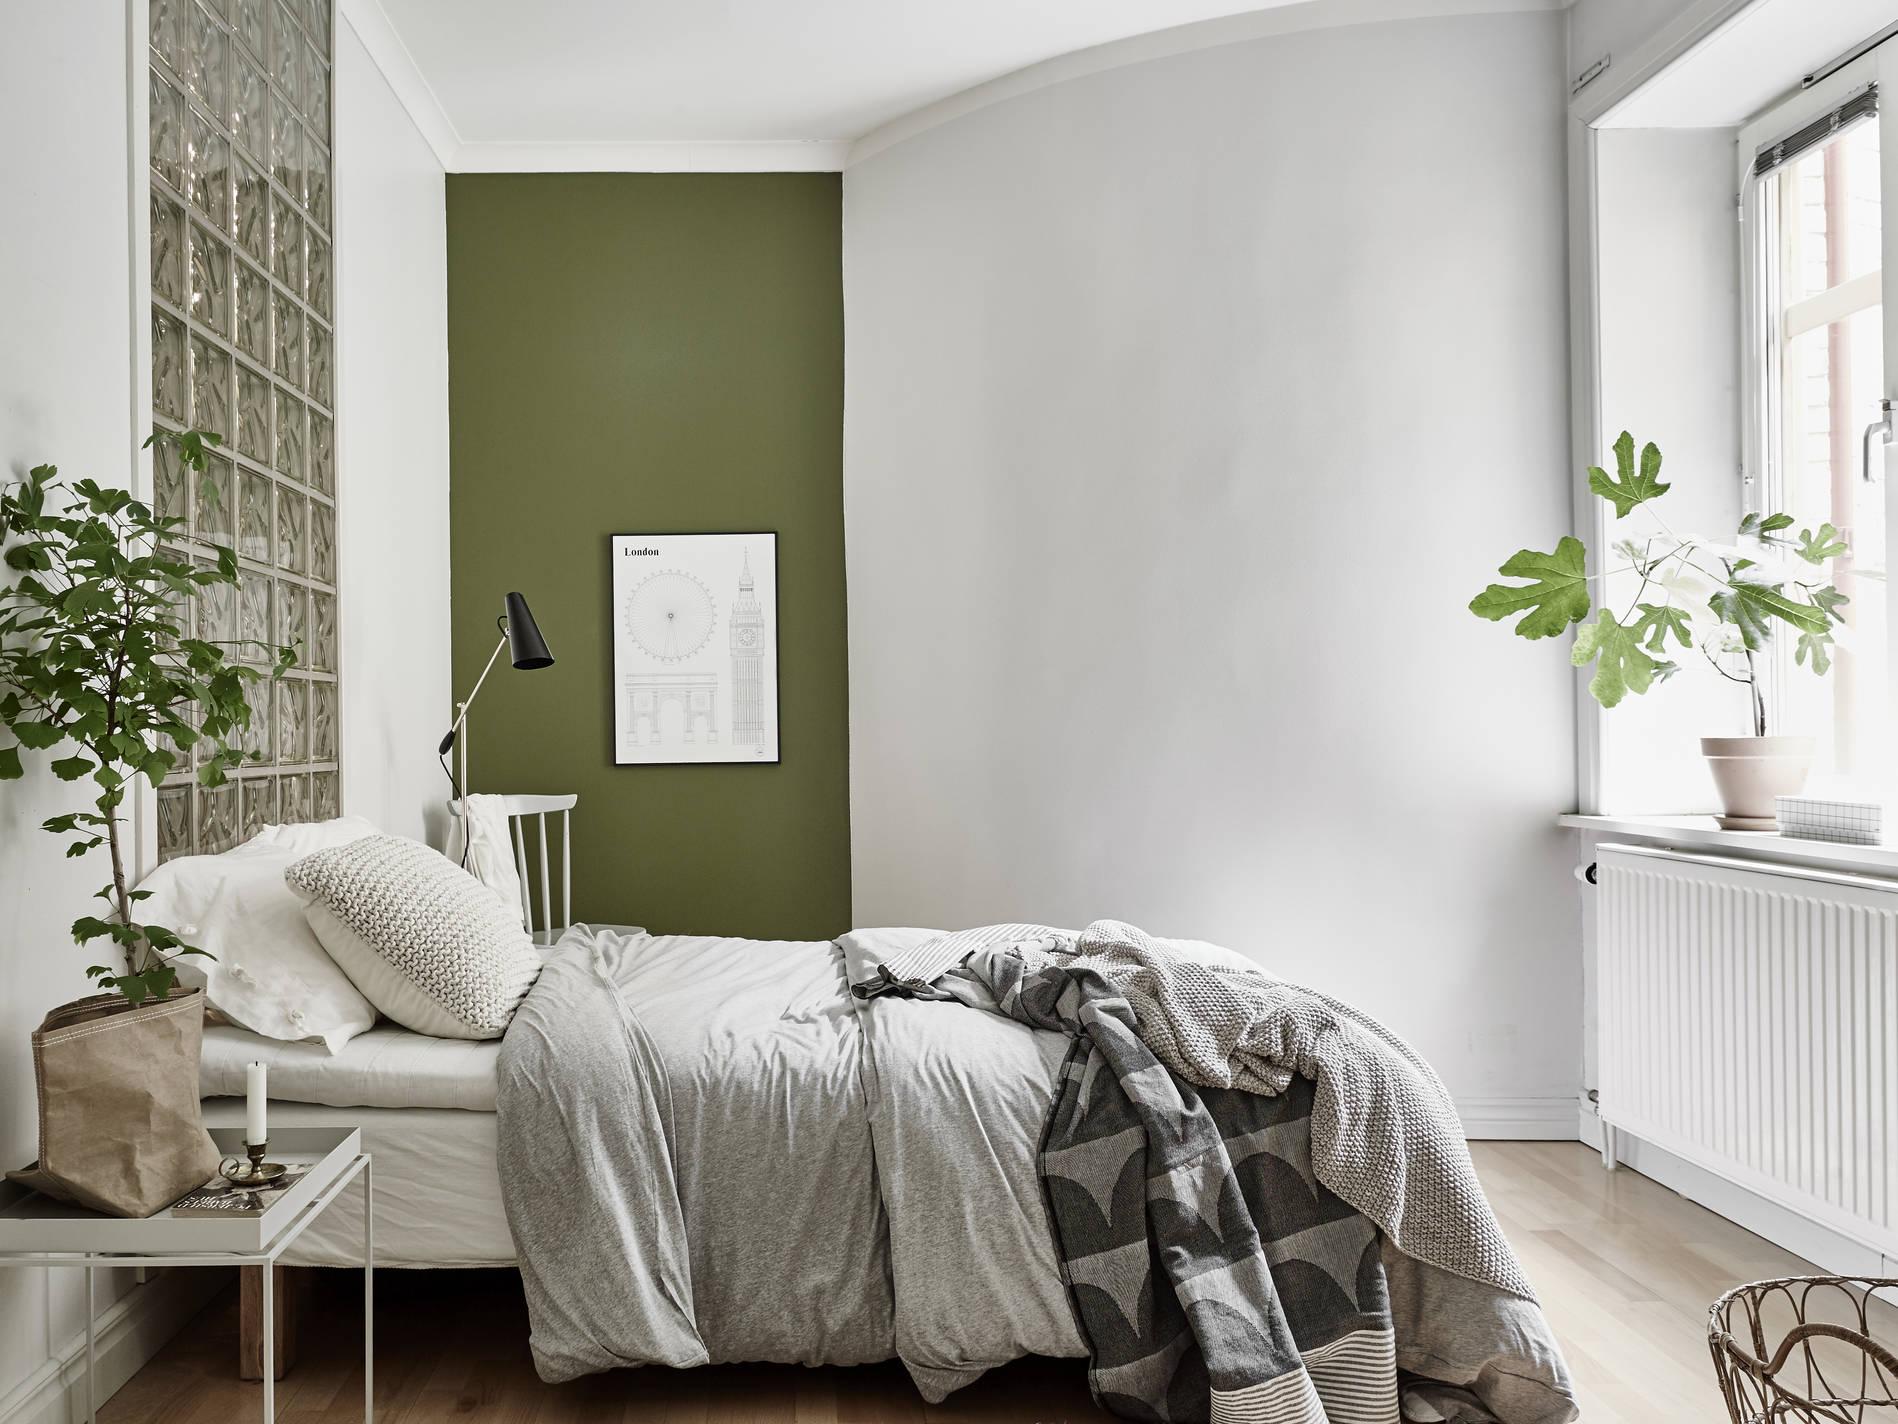 Slaapkamer met mooie kleine details   Interieur inrichting